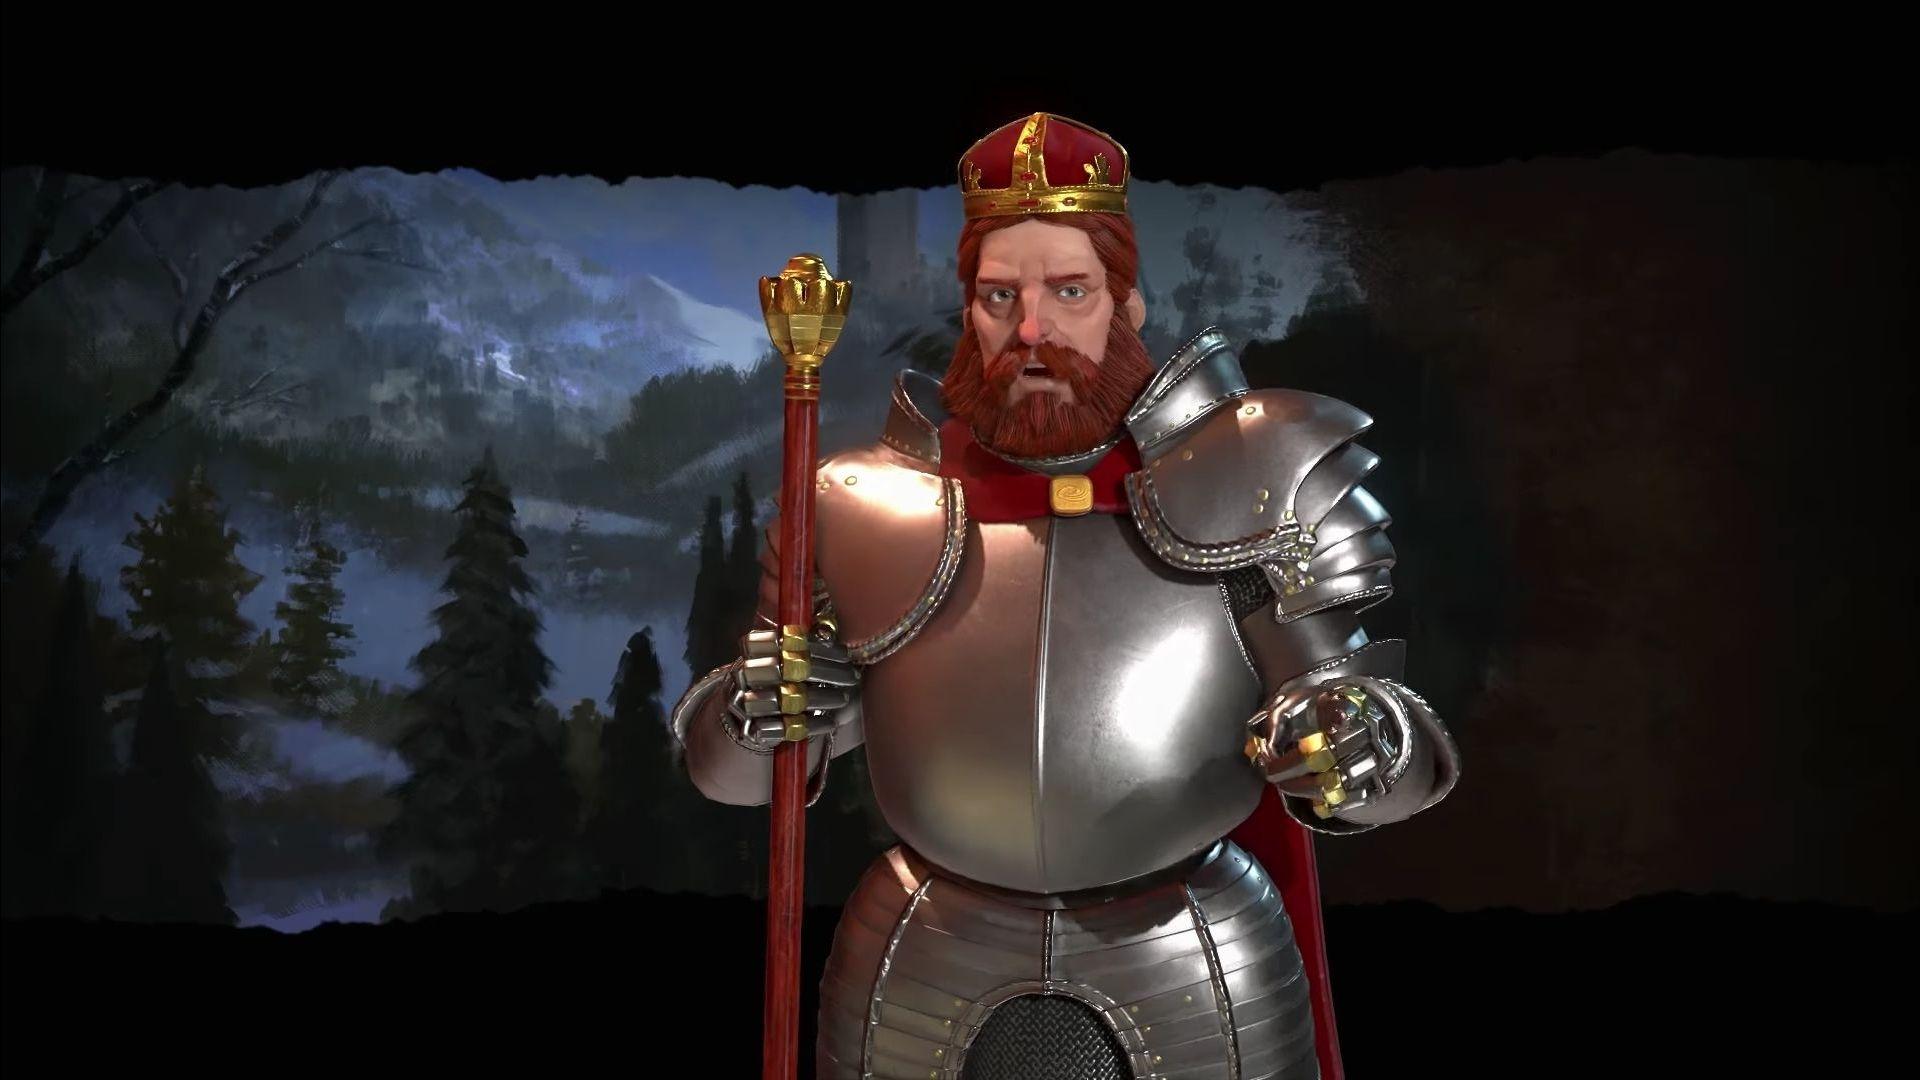 civilization vi introduces germany and barbarossa at gamescom